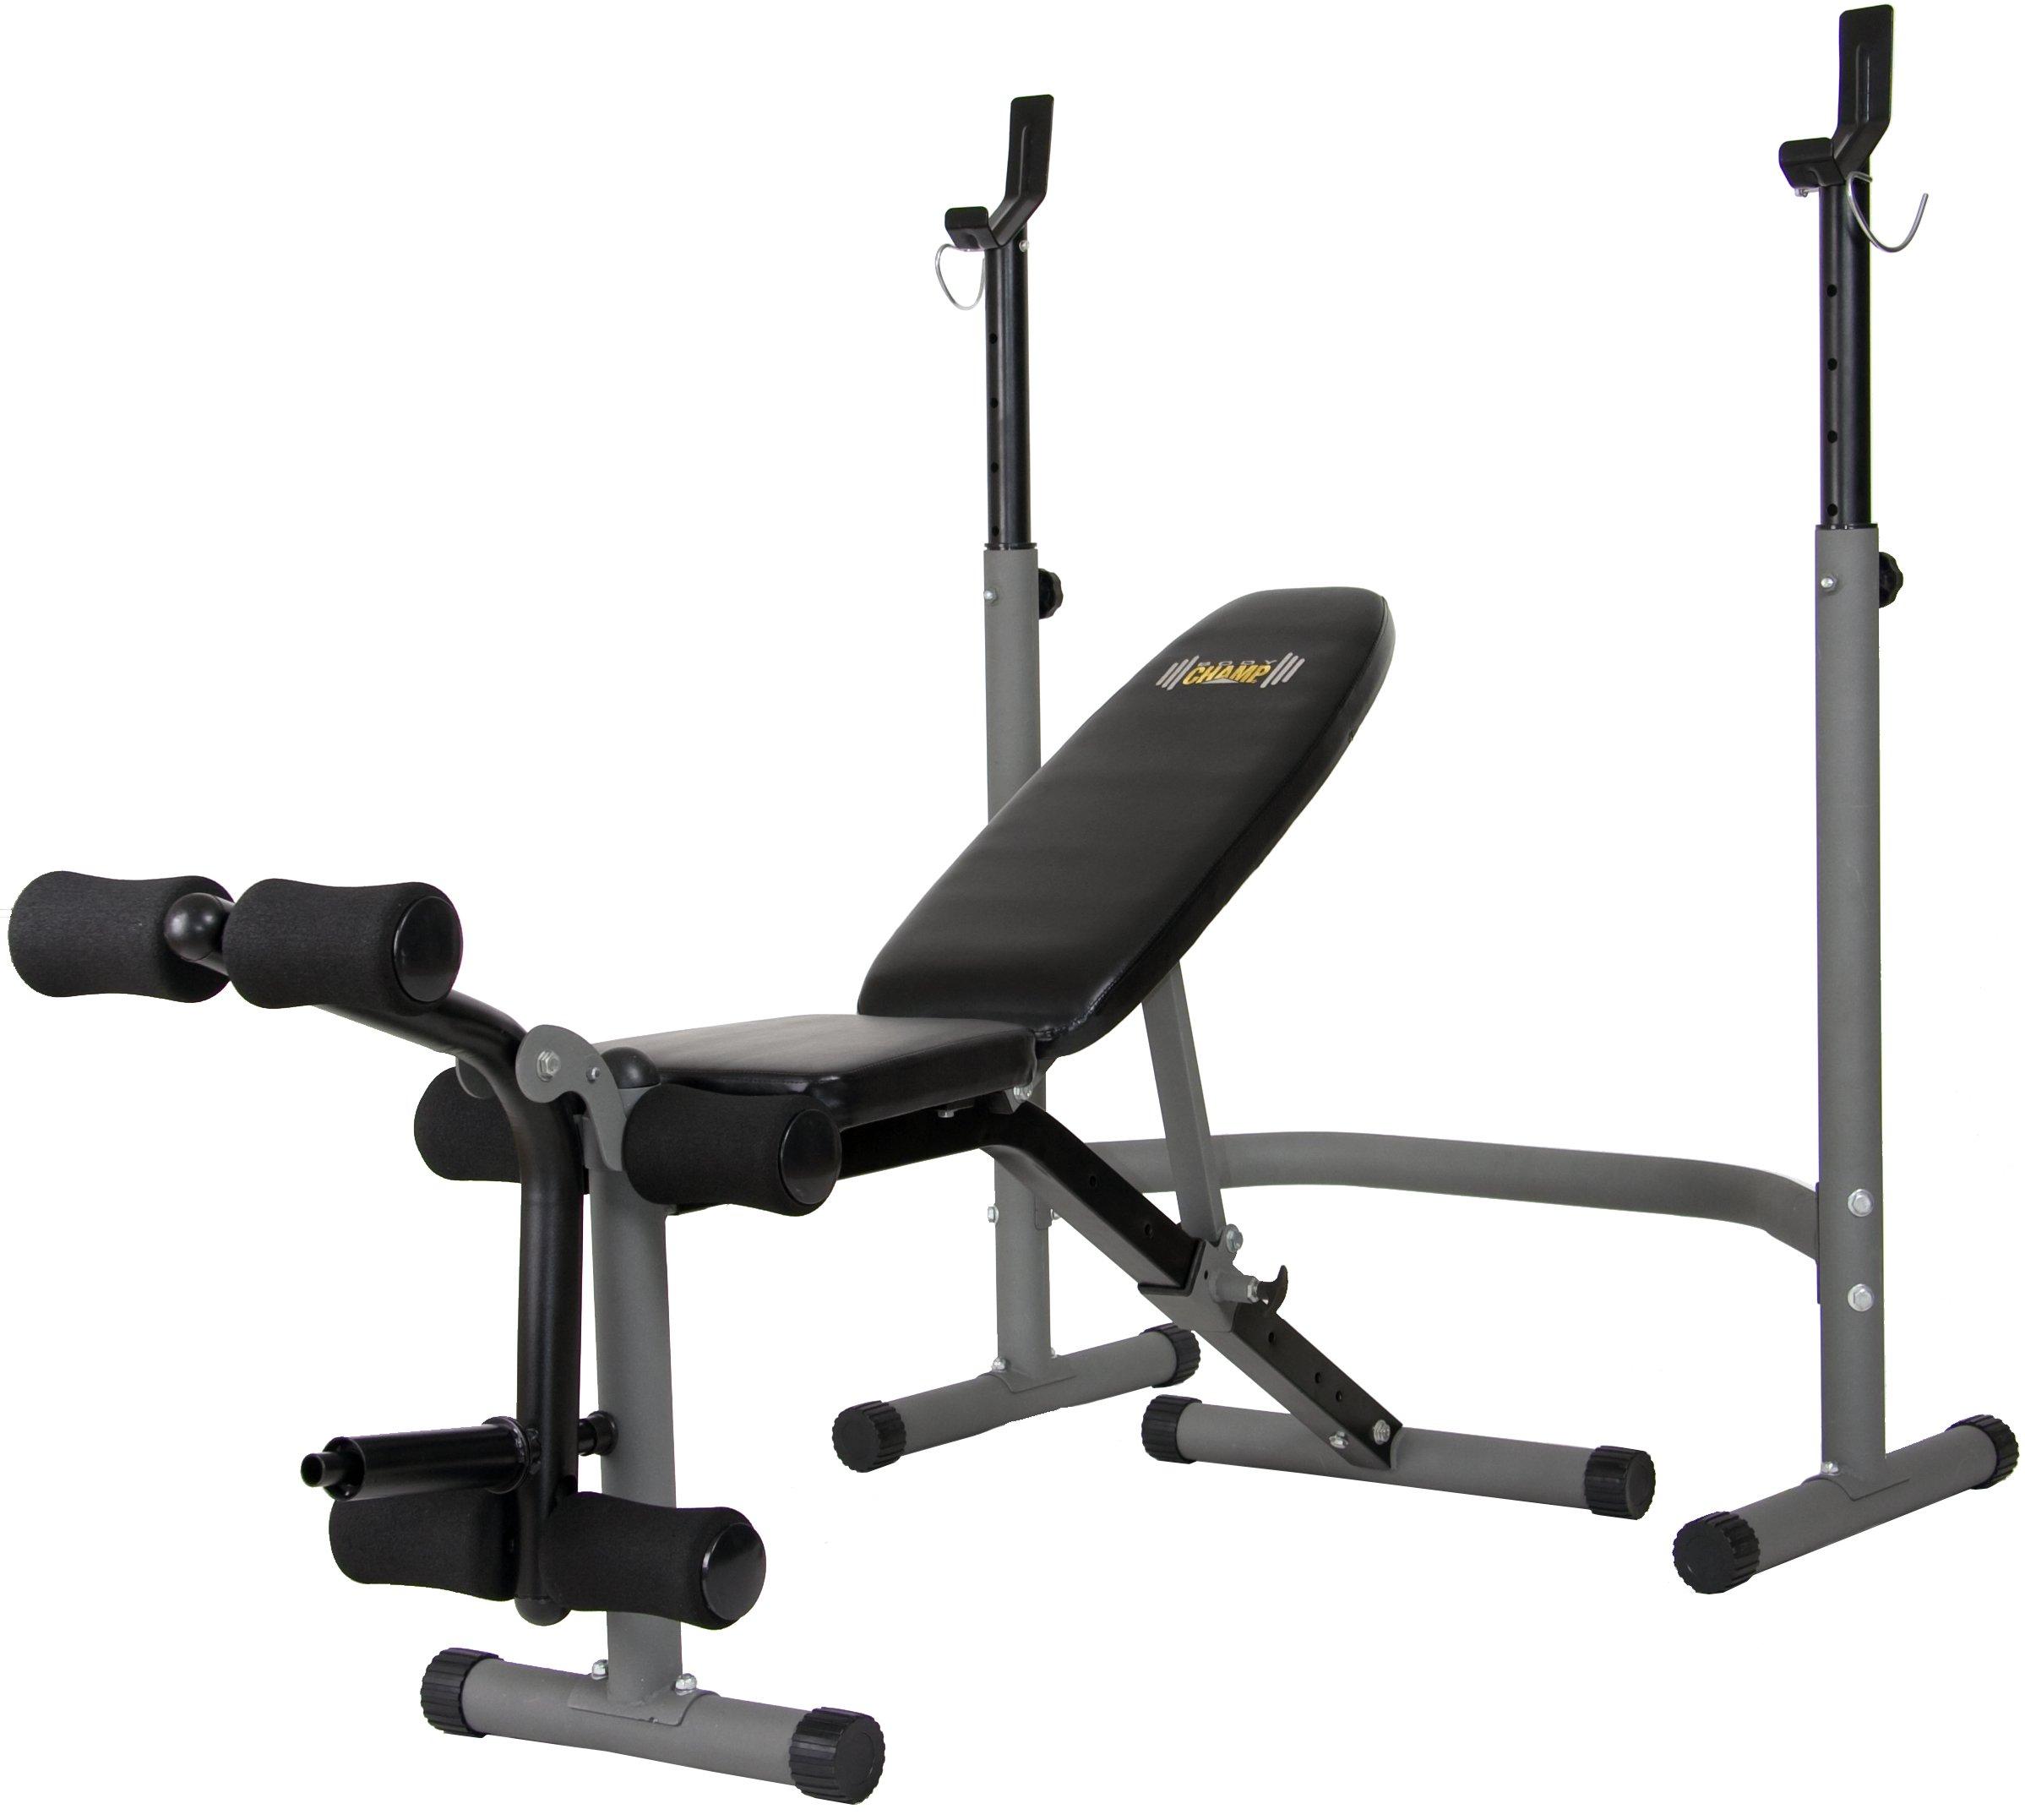 Body Power BCB3890 Olympic Width Weight Bench System